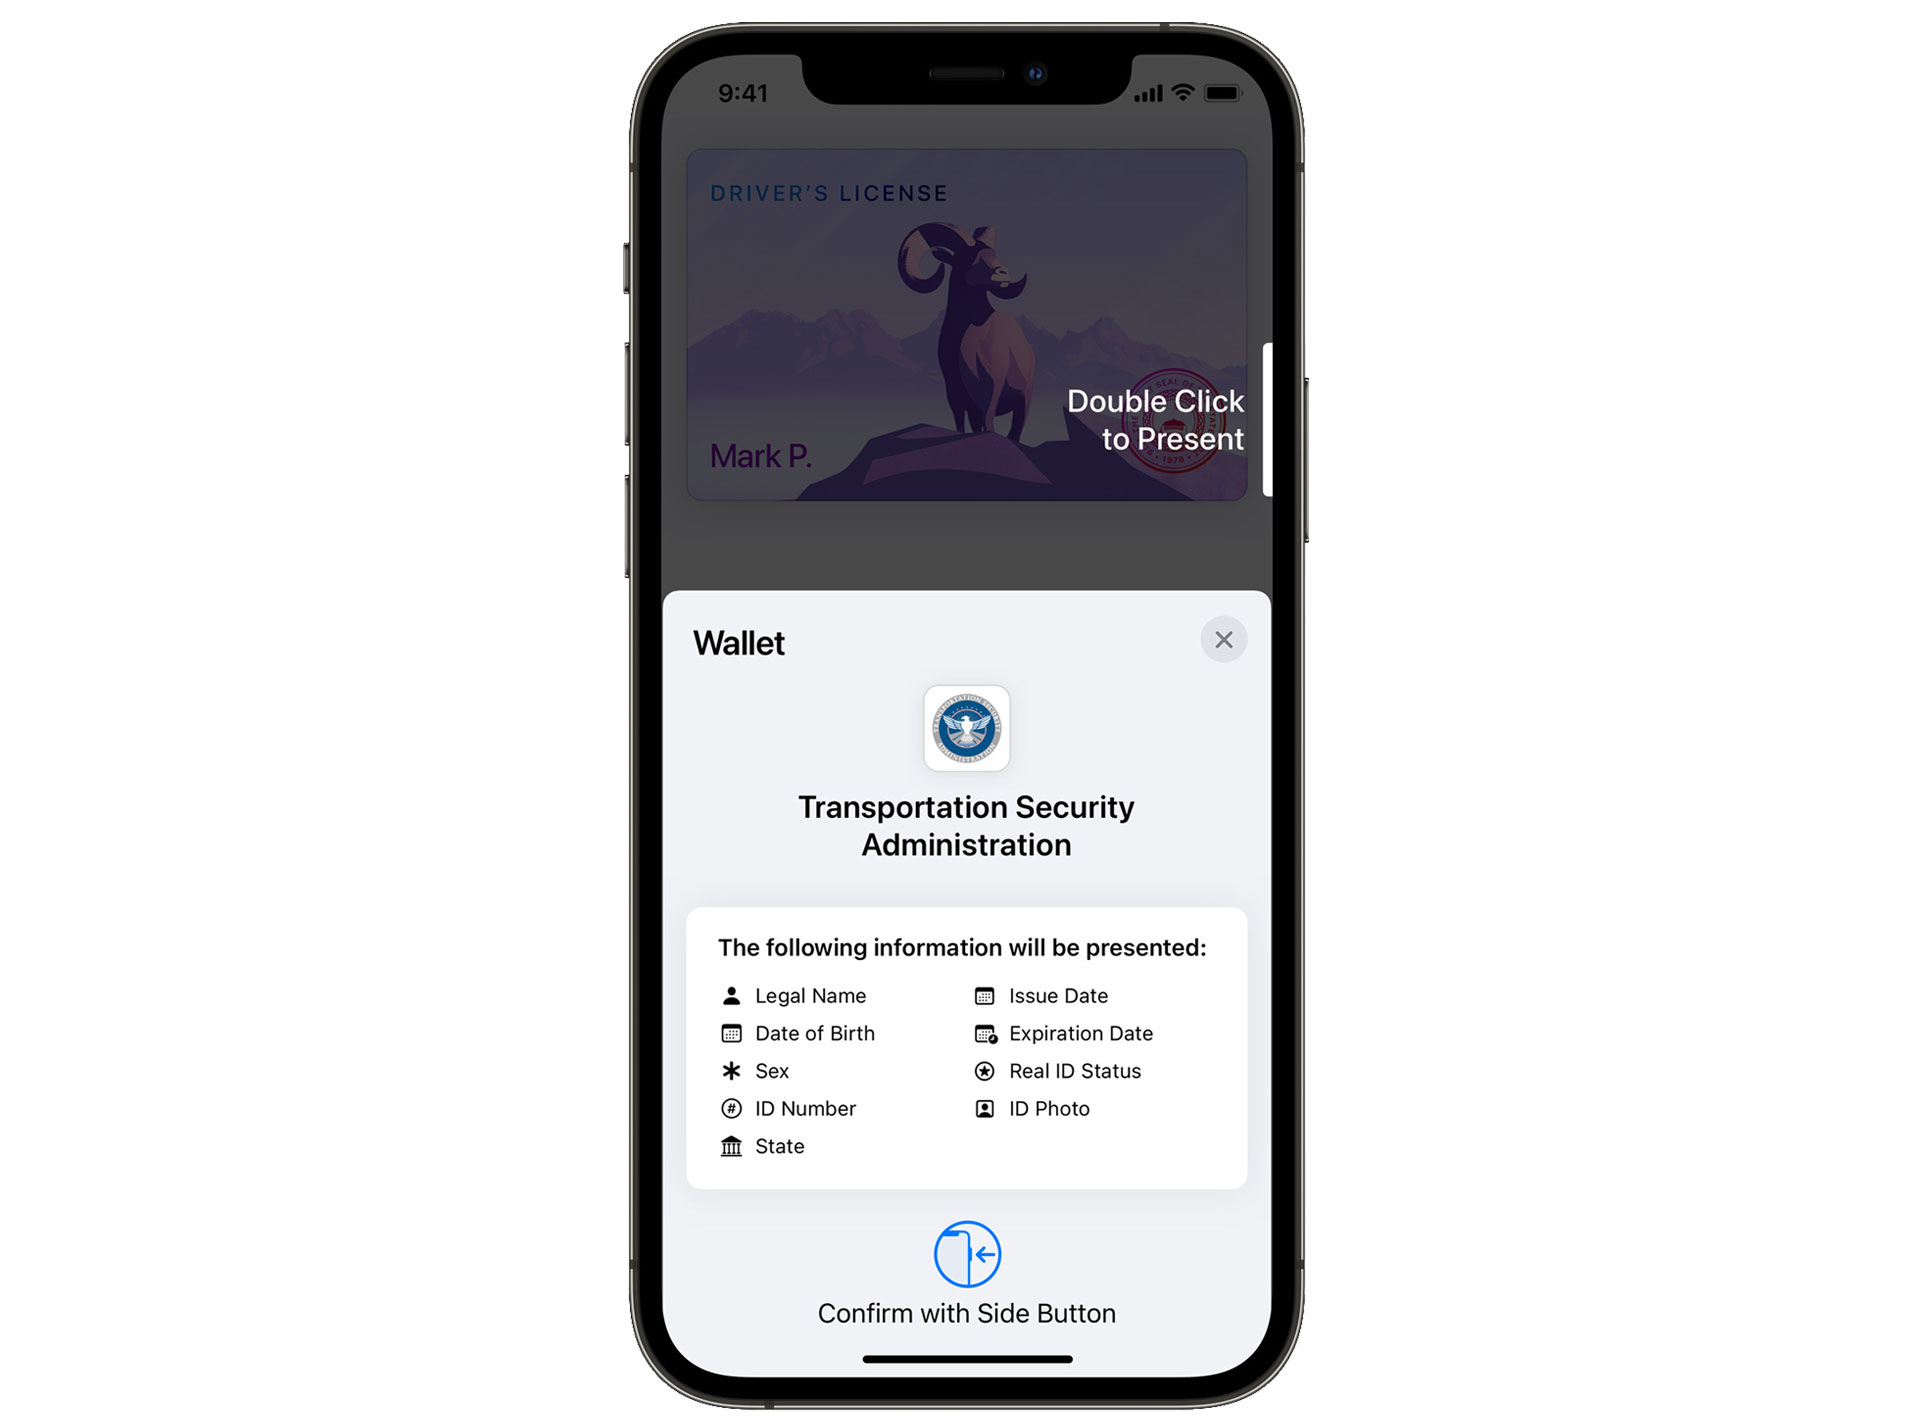 https://www.macfreak.nl/modules/news/images/zArt.AppleWalletStateID-2.jpg